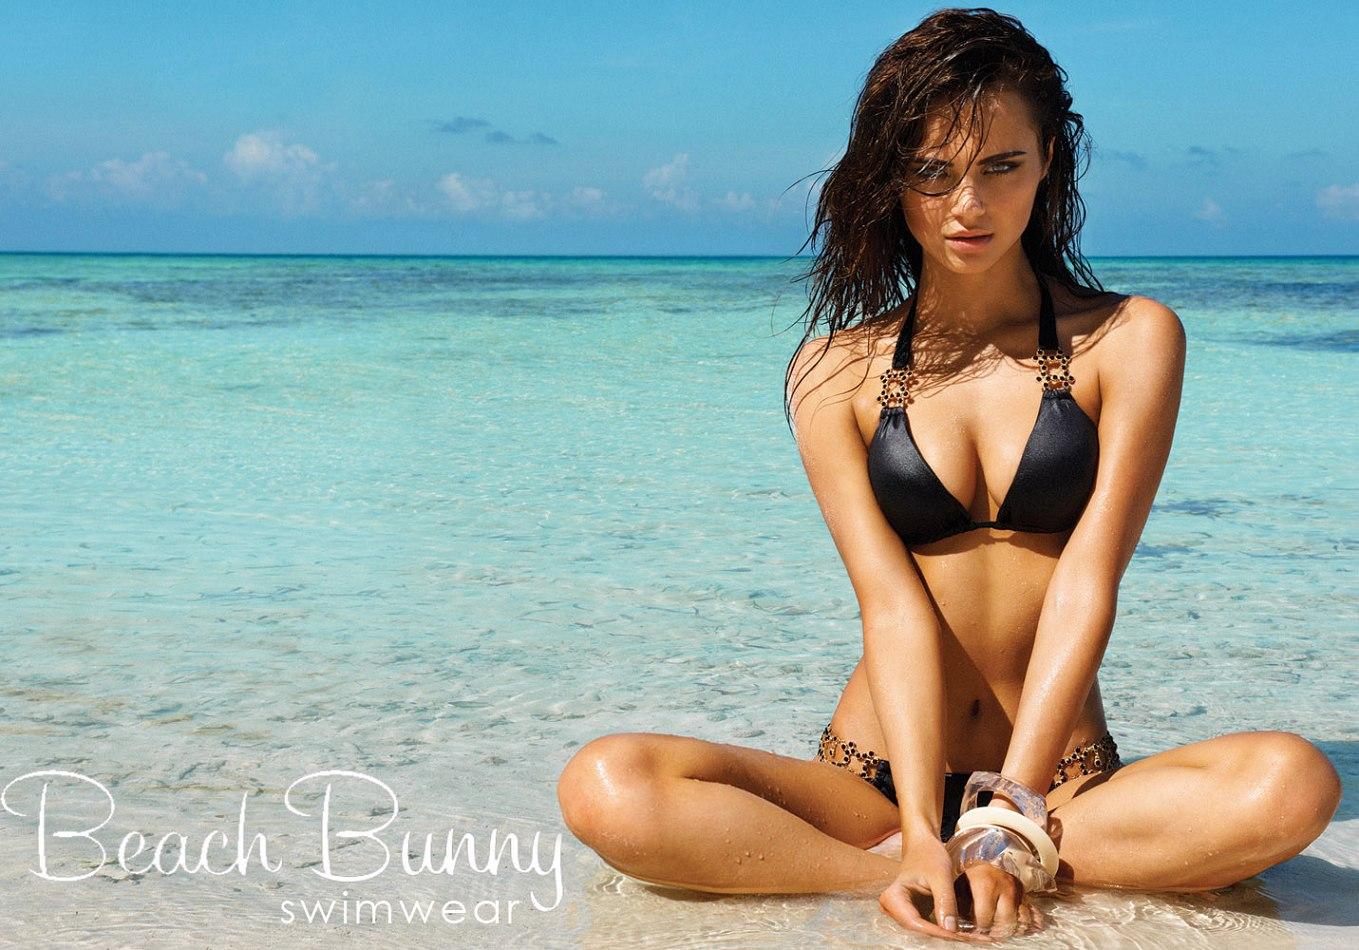 Bikini Xenia Deli nudes (52 photo), Tits, Bikini, Selfie, cameltoe 2015